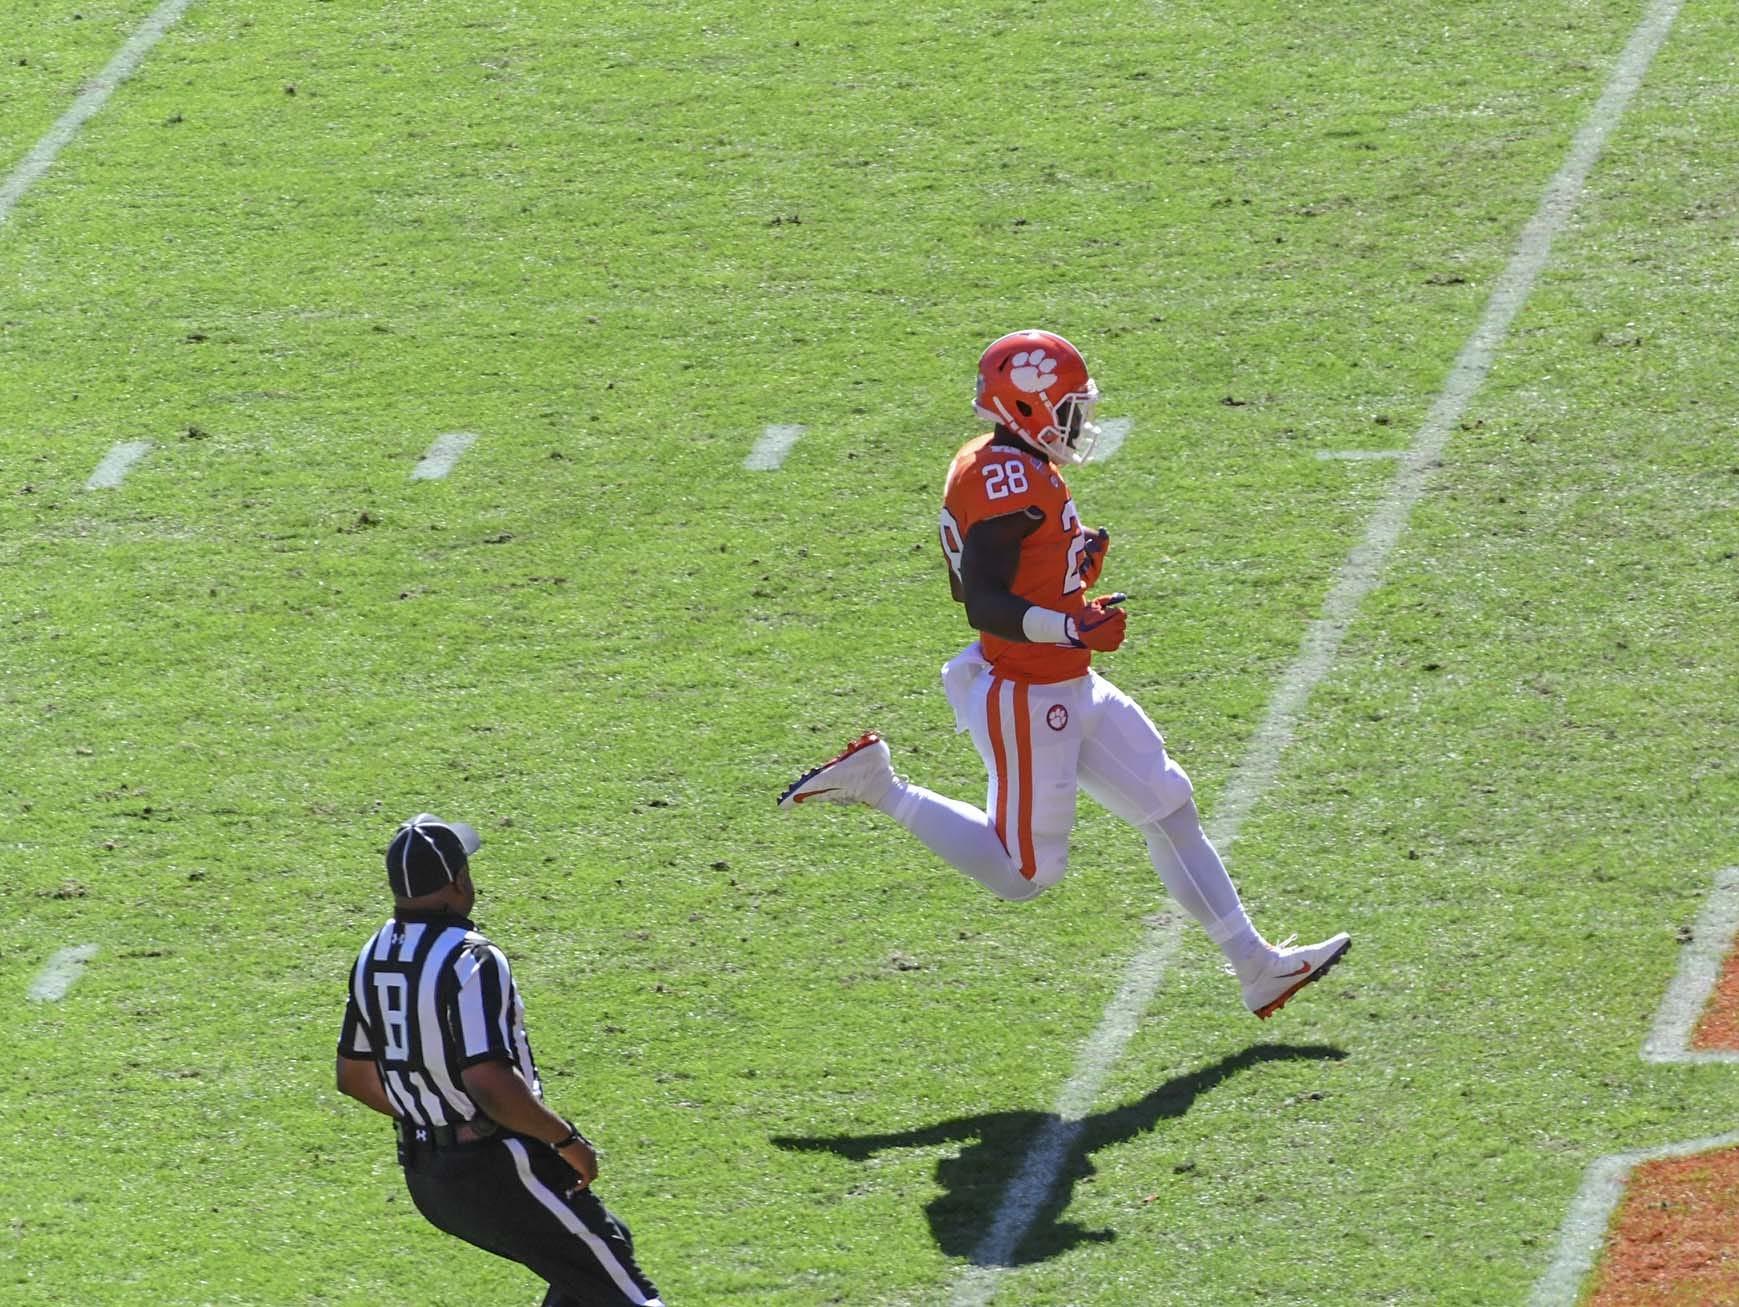 Clemson running back Tavien Feaster (28) runs a 70-yard touchdown against Louisville during the first quarter in Memorial Stadium on Saturday, November 3, 2018.